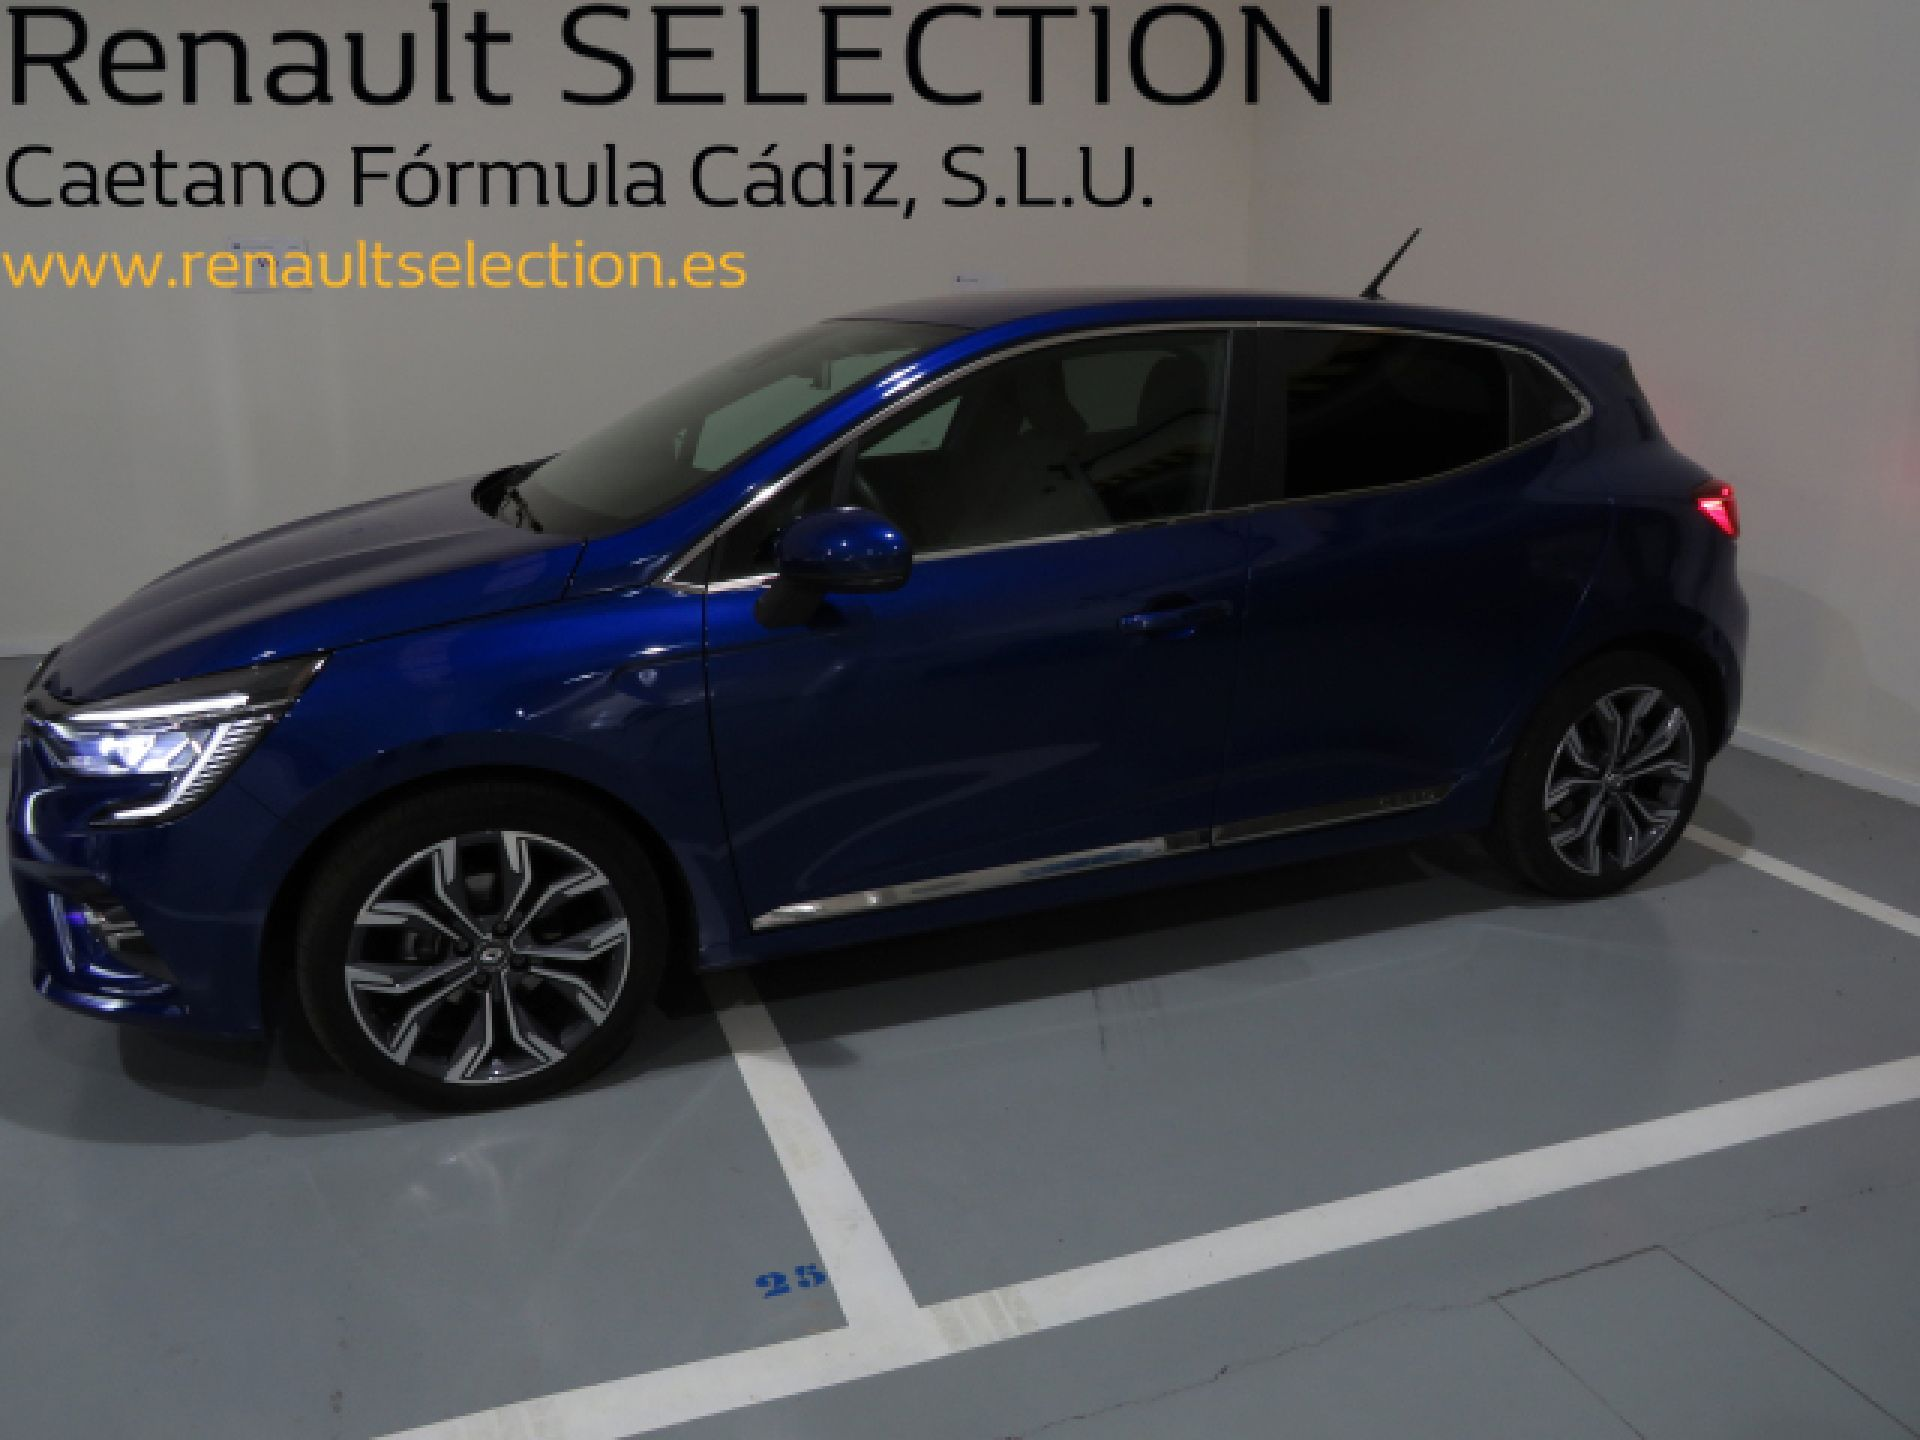 Renault Clio Zen Blue dCi 85 kW (115CV) segunda mano Cádiz